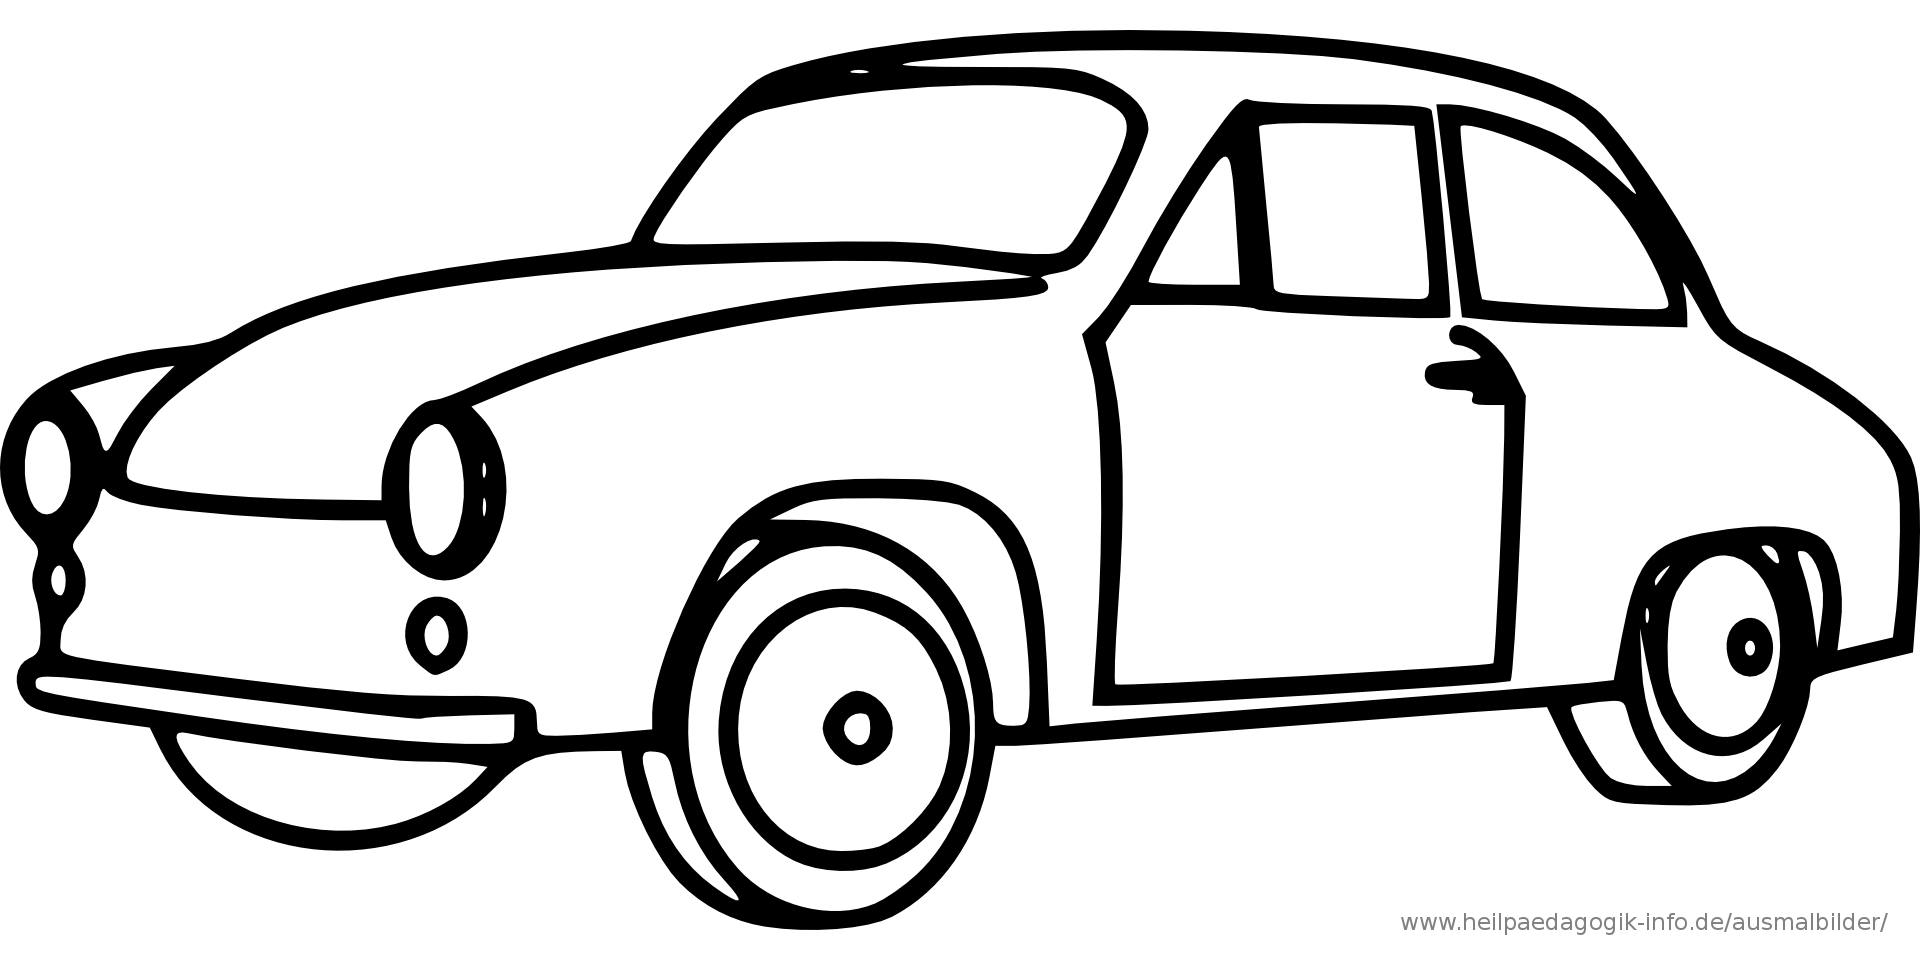 auto ausmalbilder 06 | Kinderspiele | Pinterest | Auto ausmalbilder ...